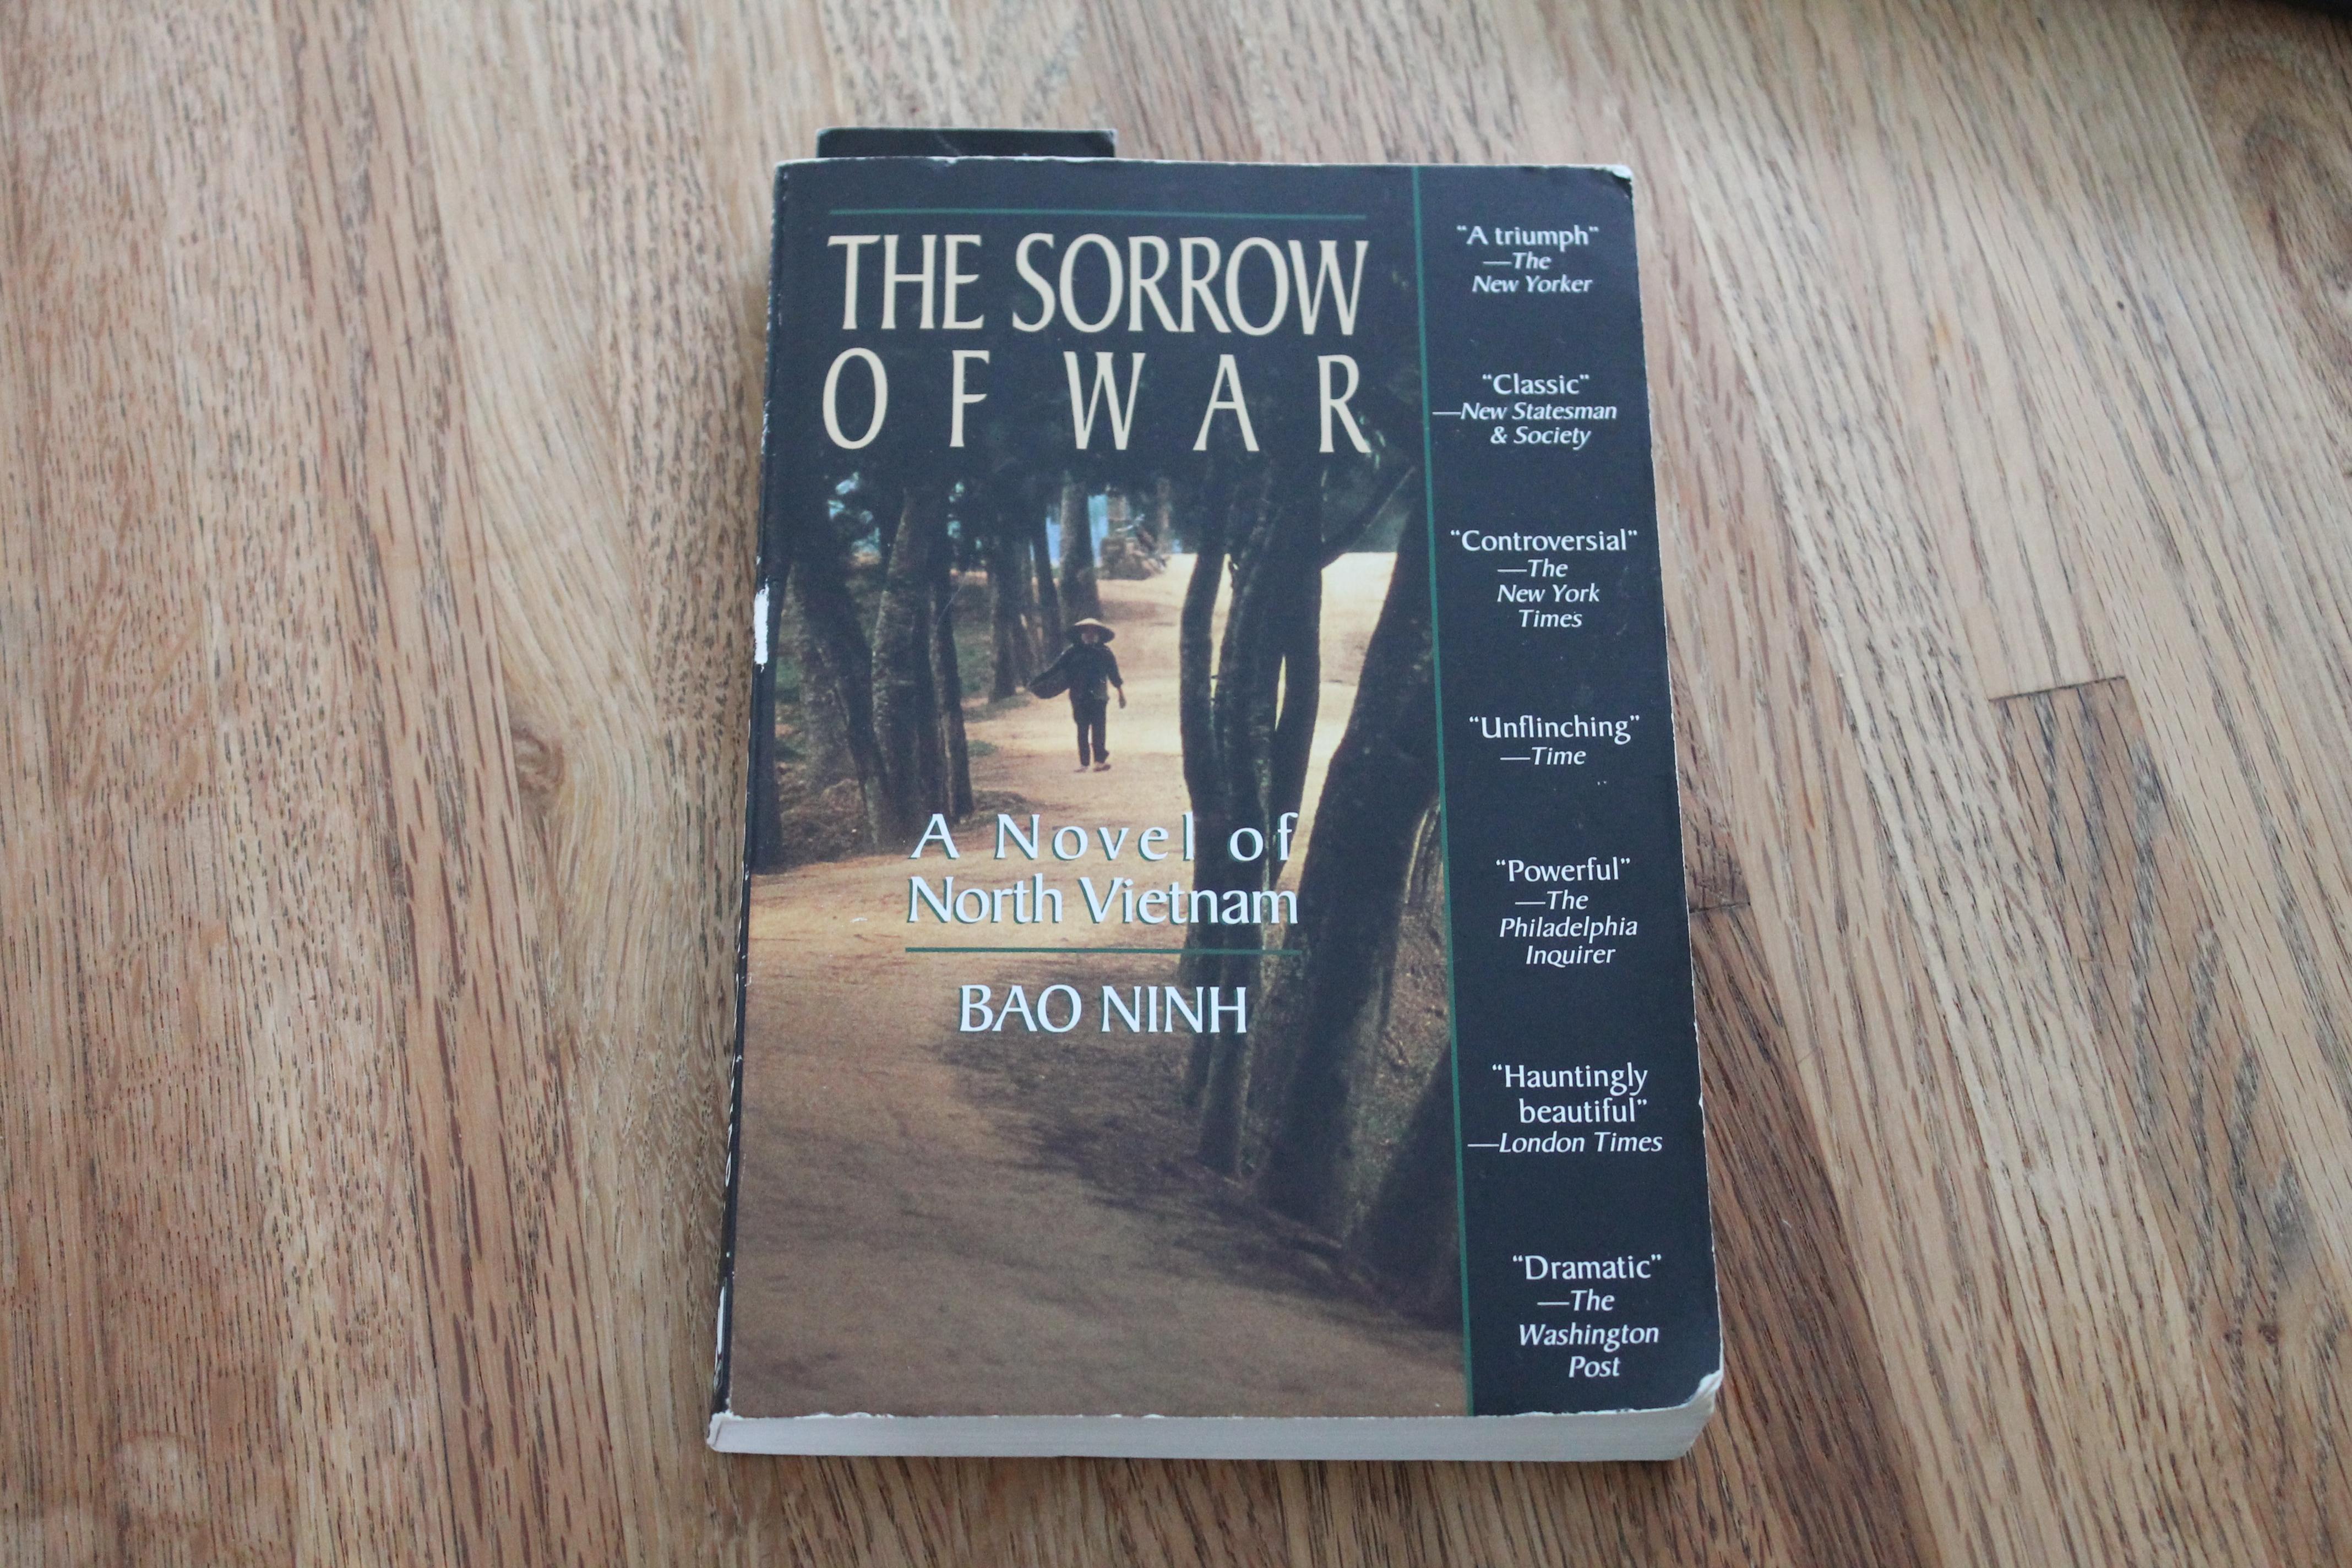 Book Review: The Sorrow of War by Bao Ninh | realizinggrace